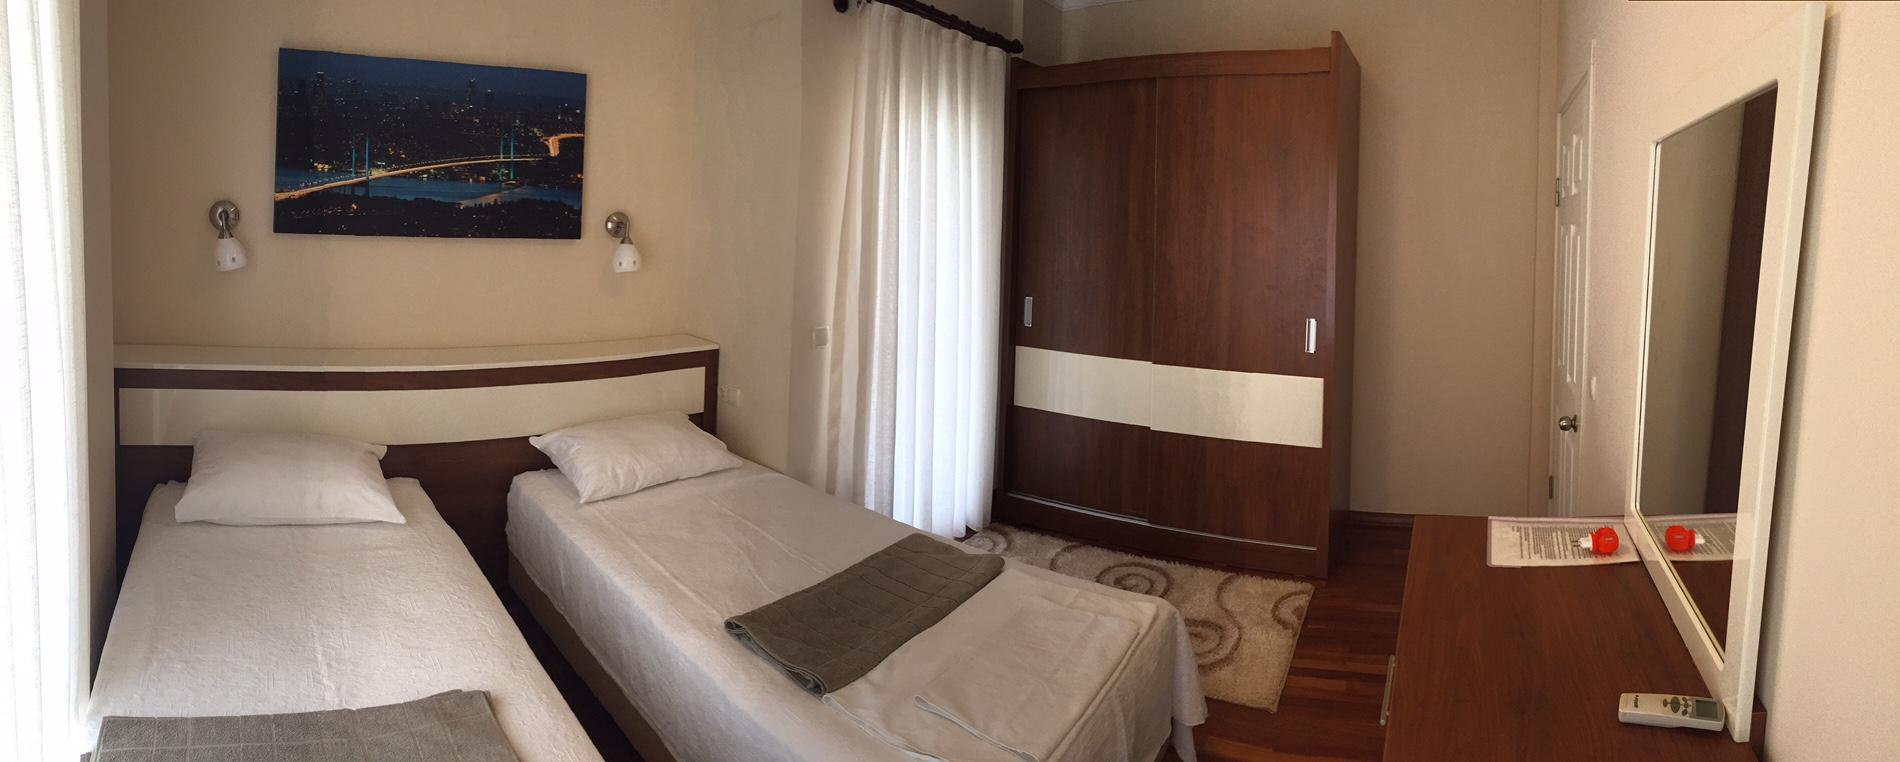 Bedroom 2_Panaromic.JPG